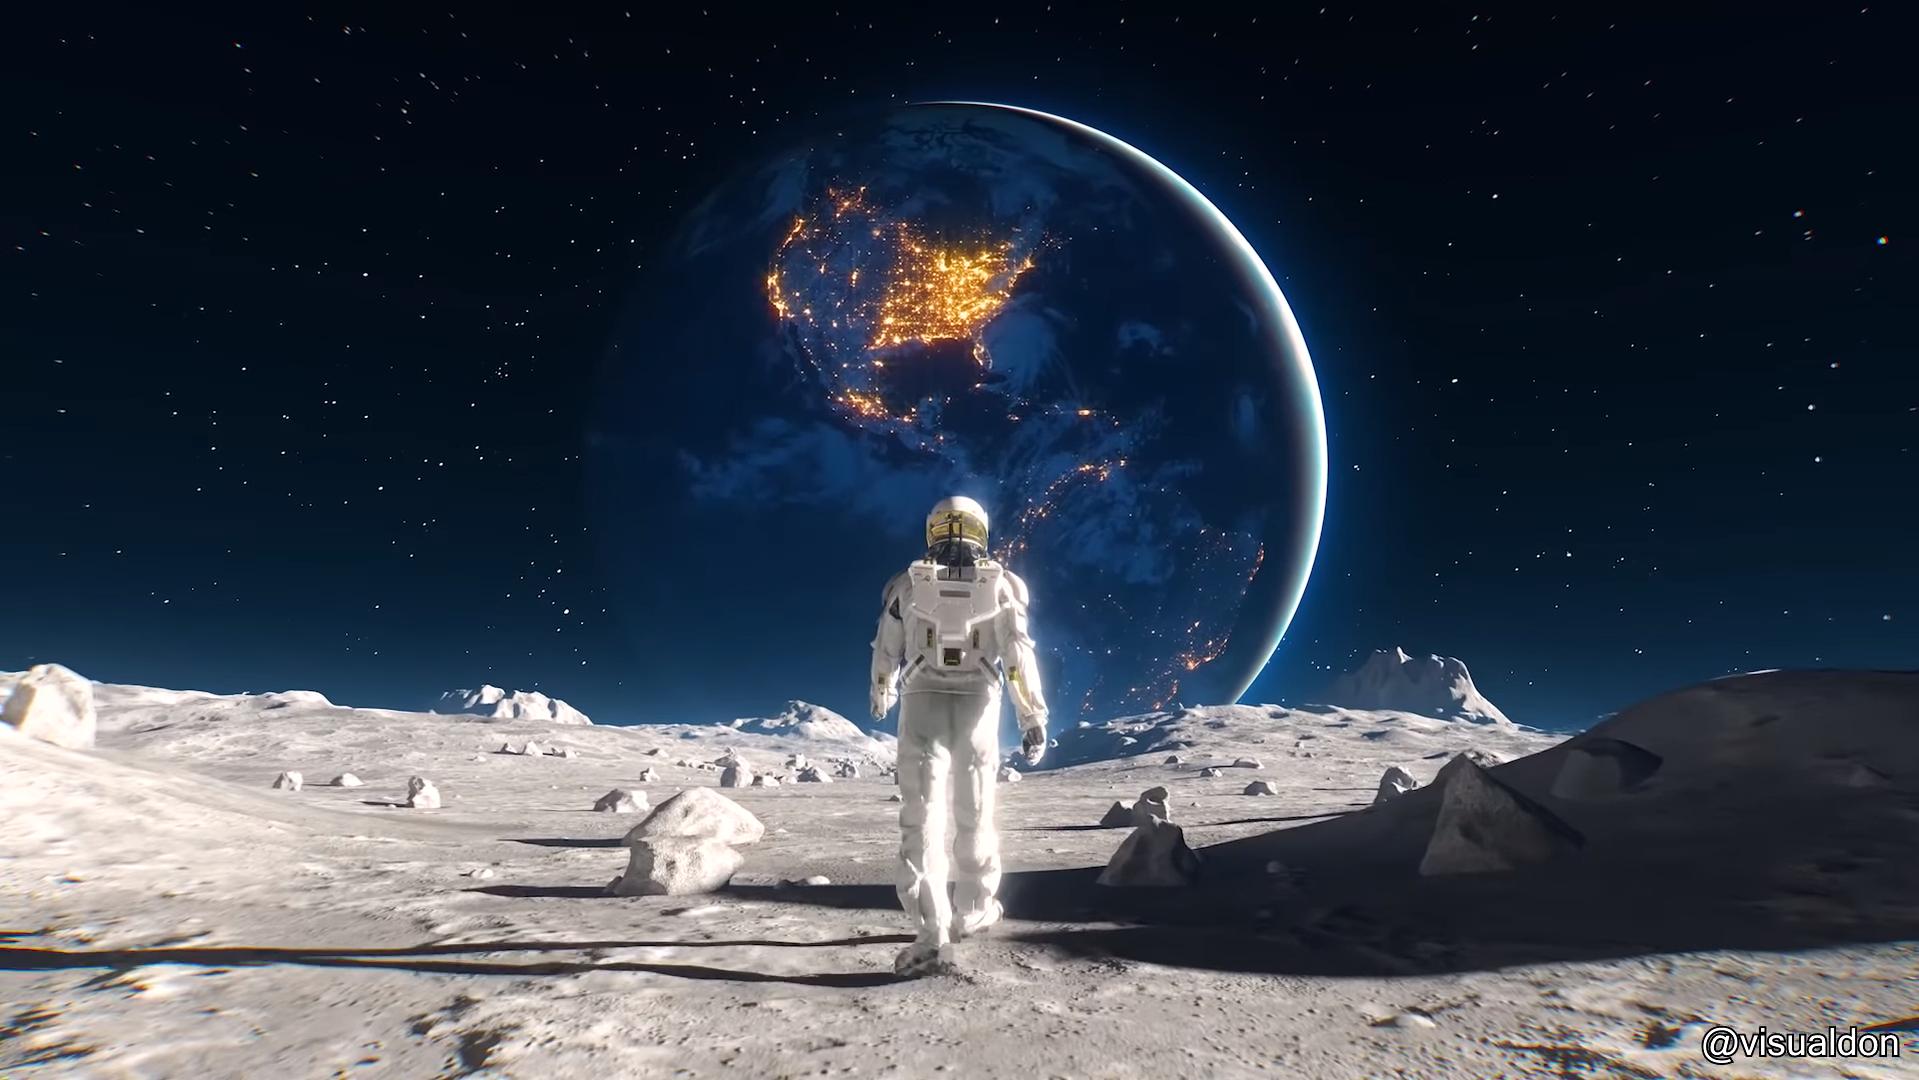 описание фото картинки планет и космонавтов поведение